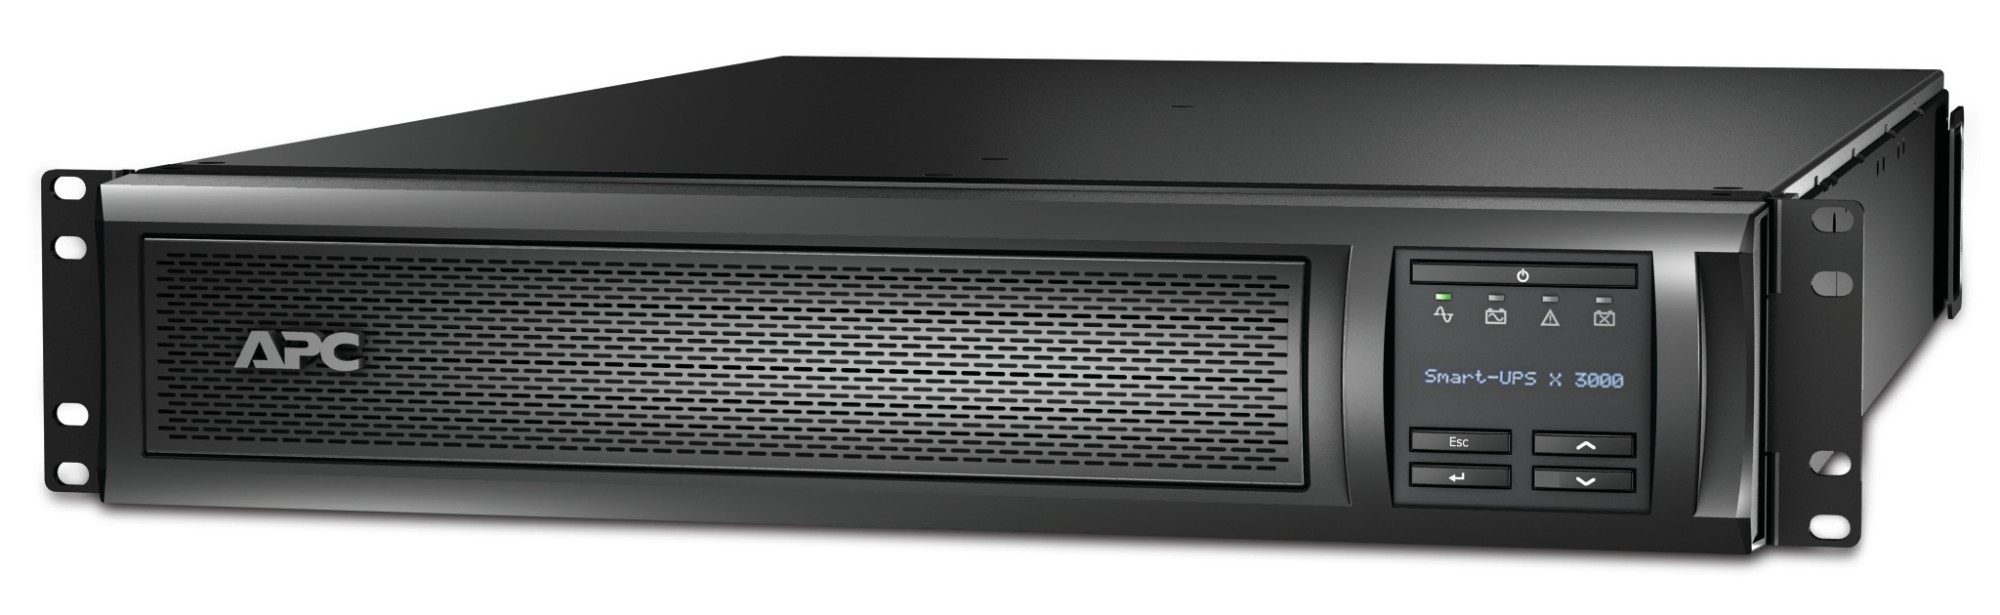 APC Smart-UPS Line-Interactive 3000 VA 2700 W 9 AC outlet(s)